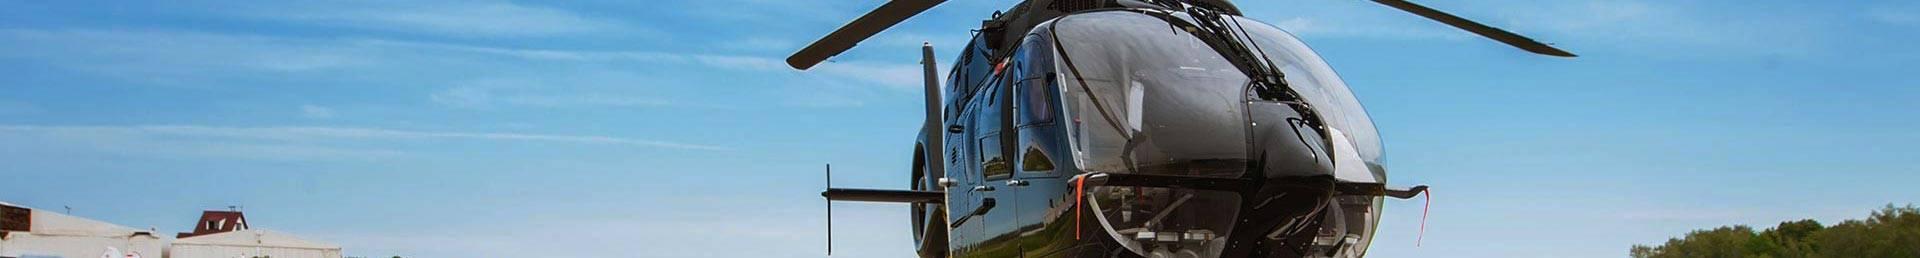 Baptême hélicoptère